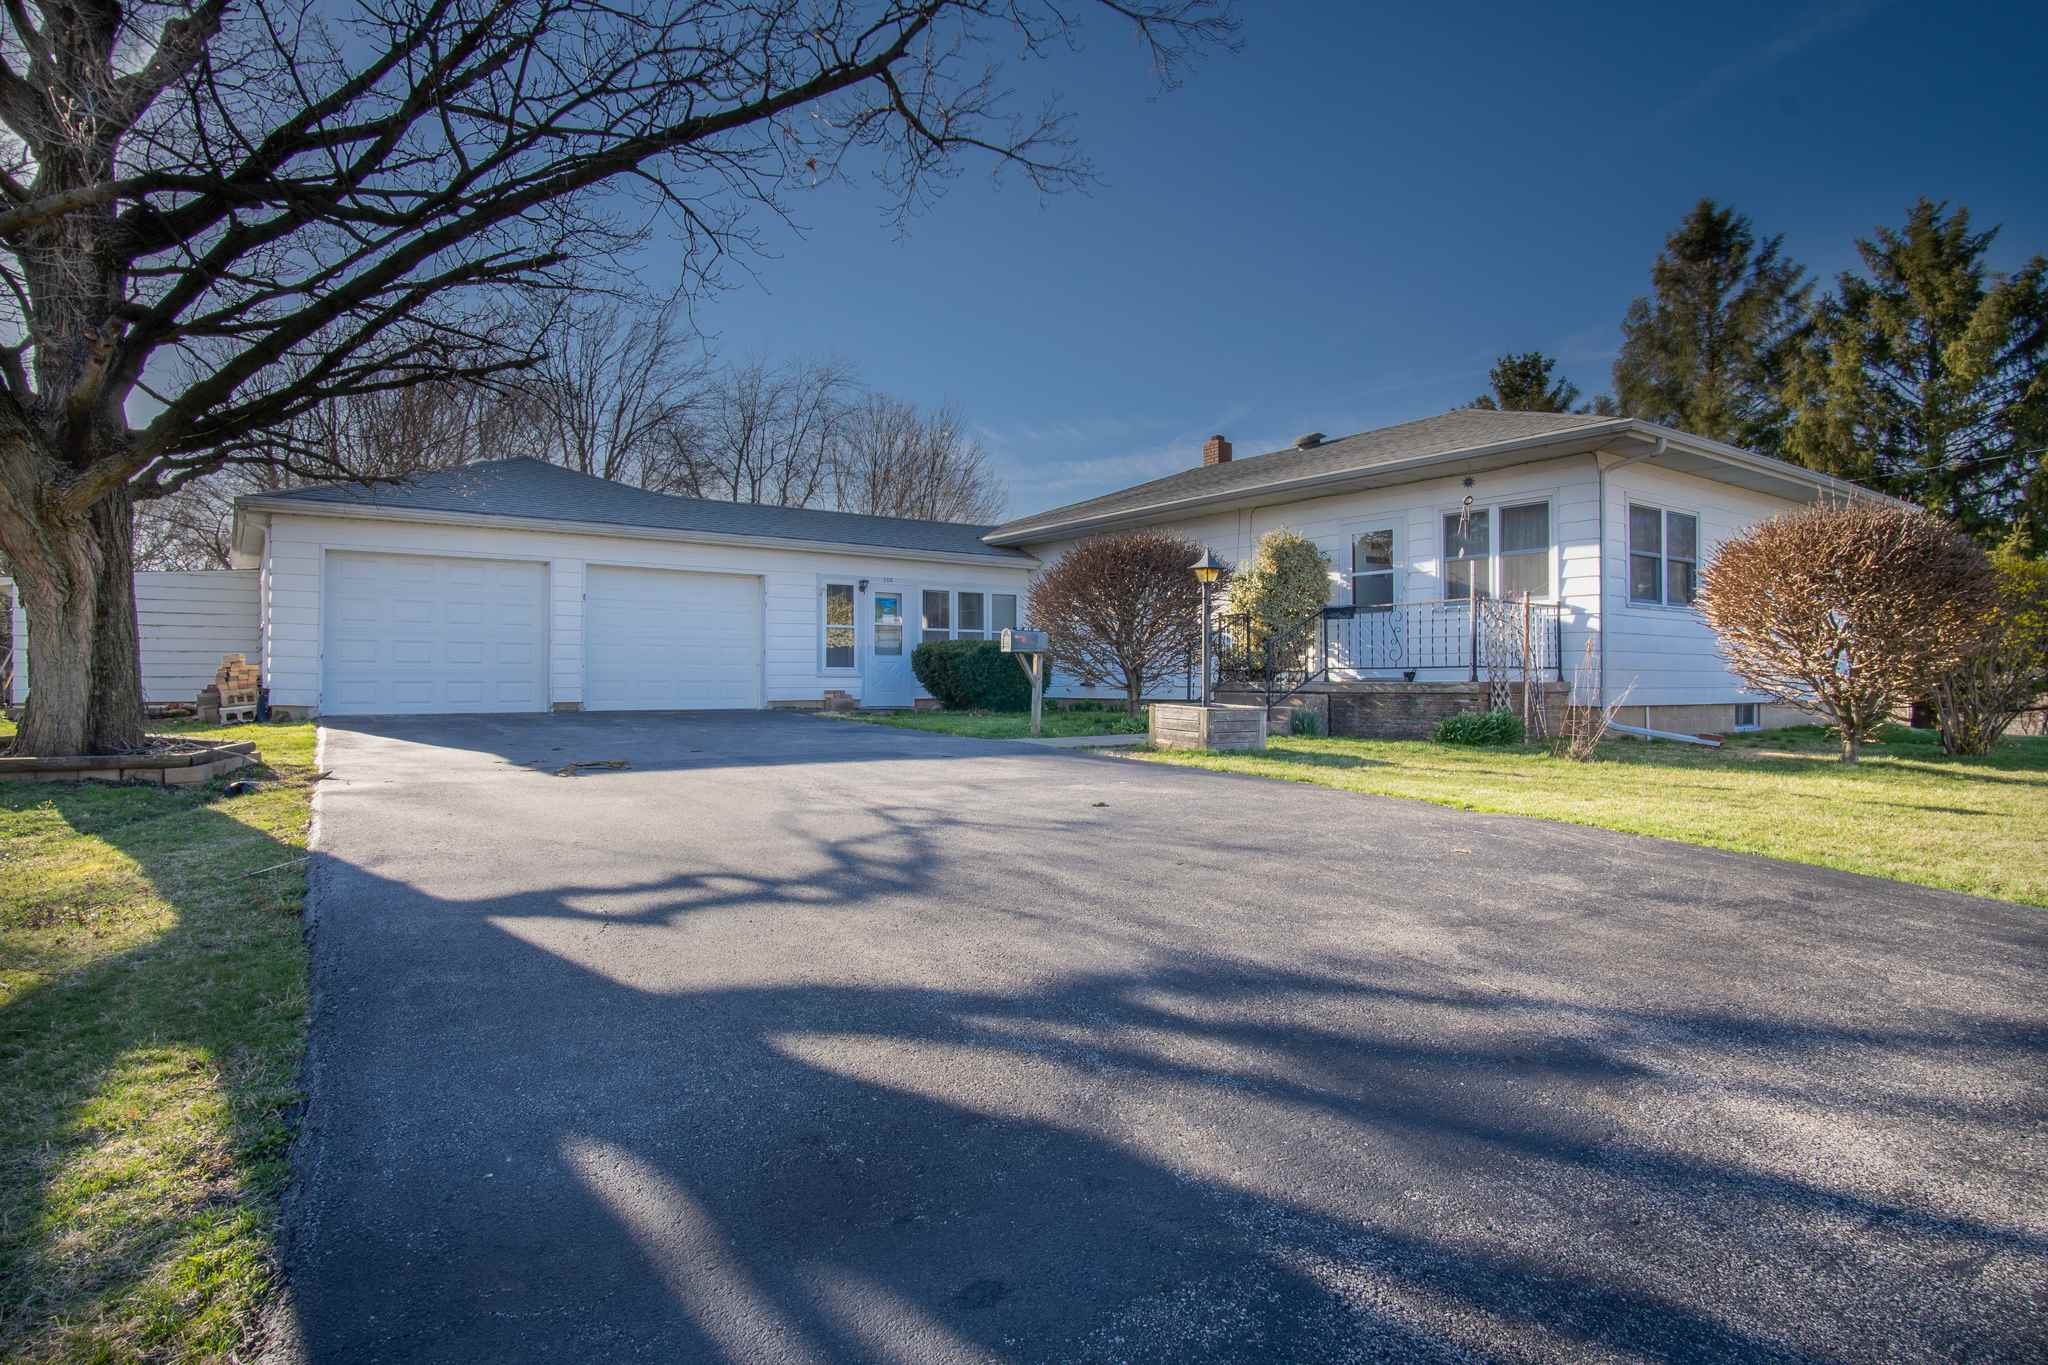 508 N JONES Property Photo - Eureka, IL real estate listing